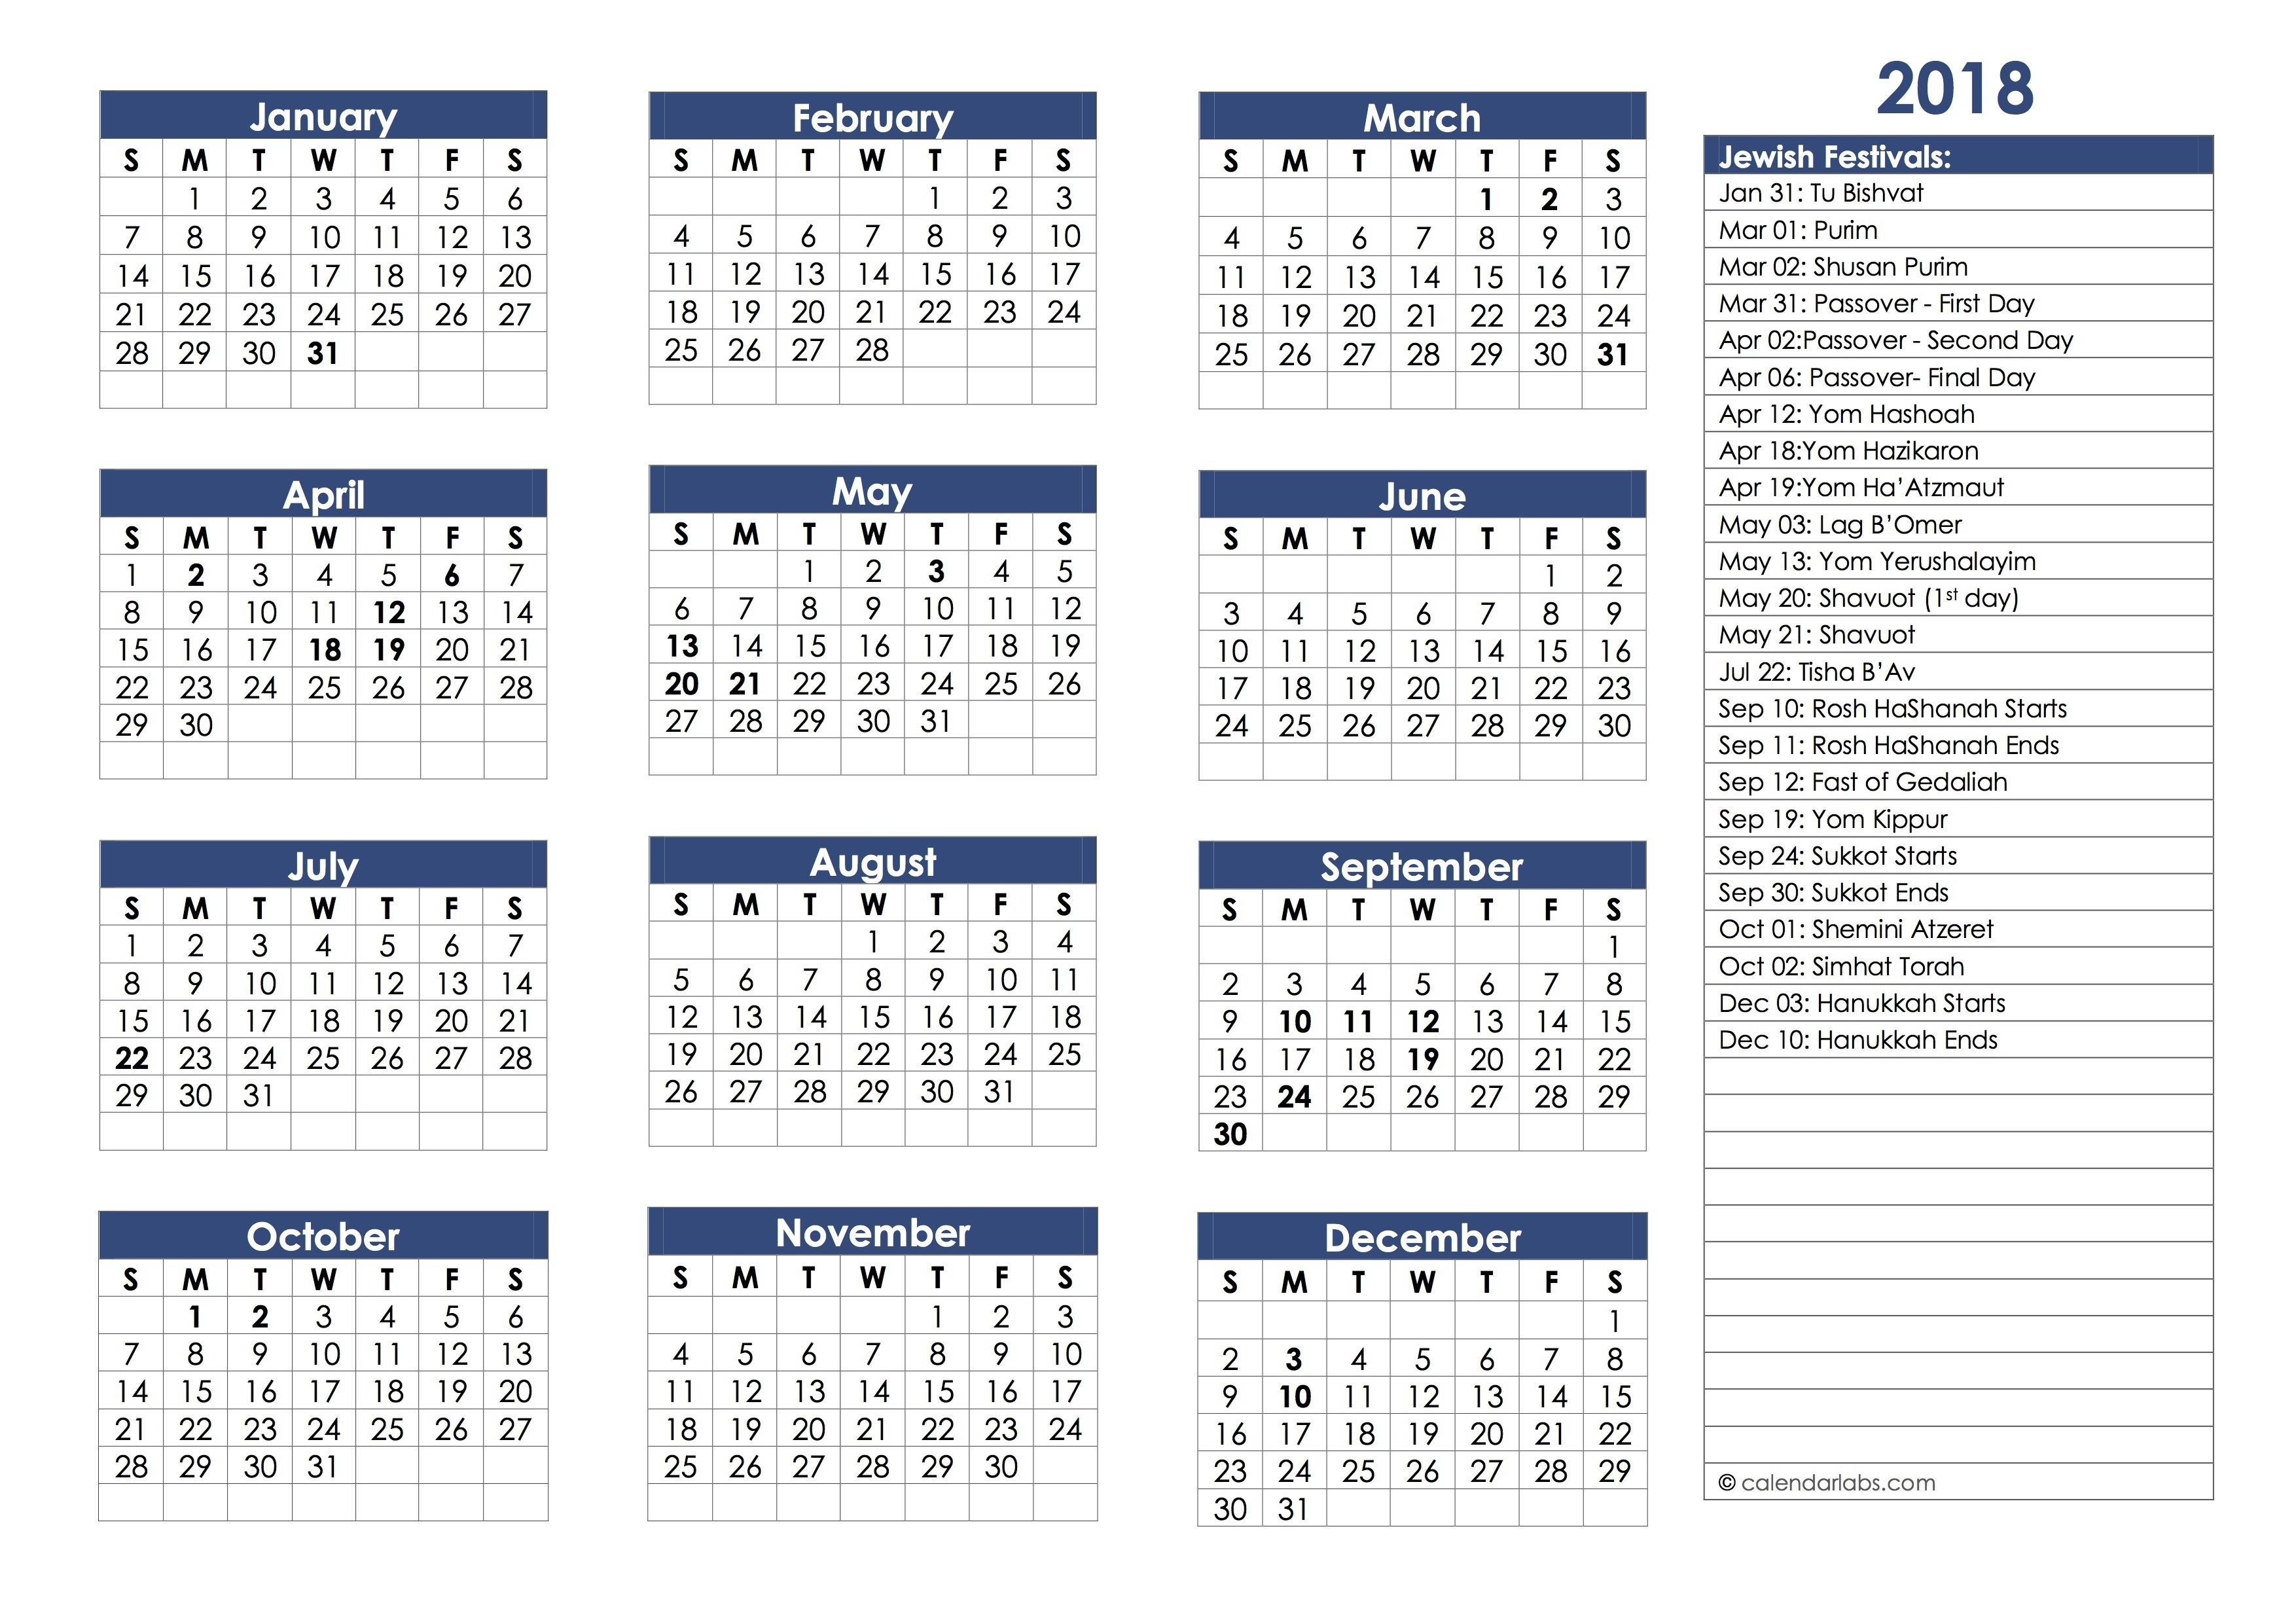 Jewish Holidays Calendar 2018 – Hebrew Calendar Festivals-Calendar Of Jewish Holidays